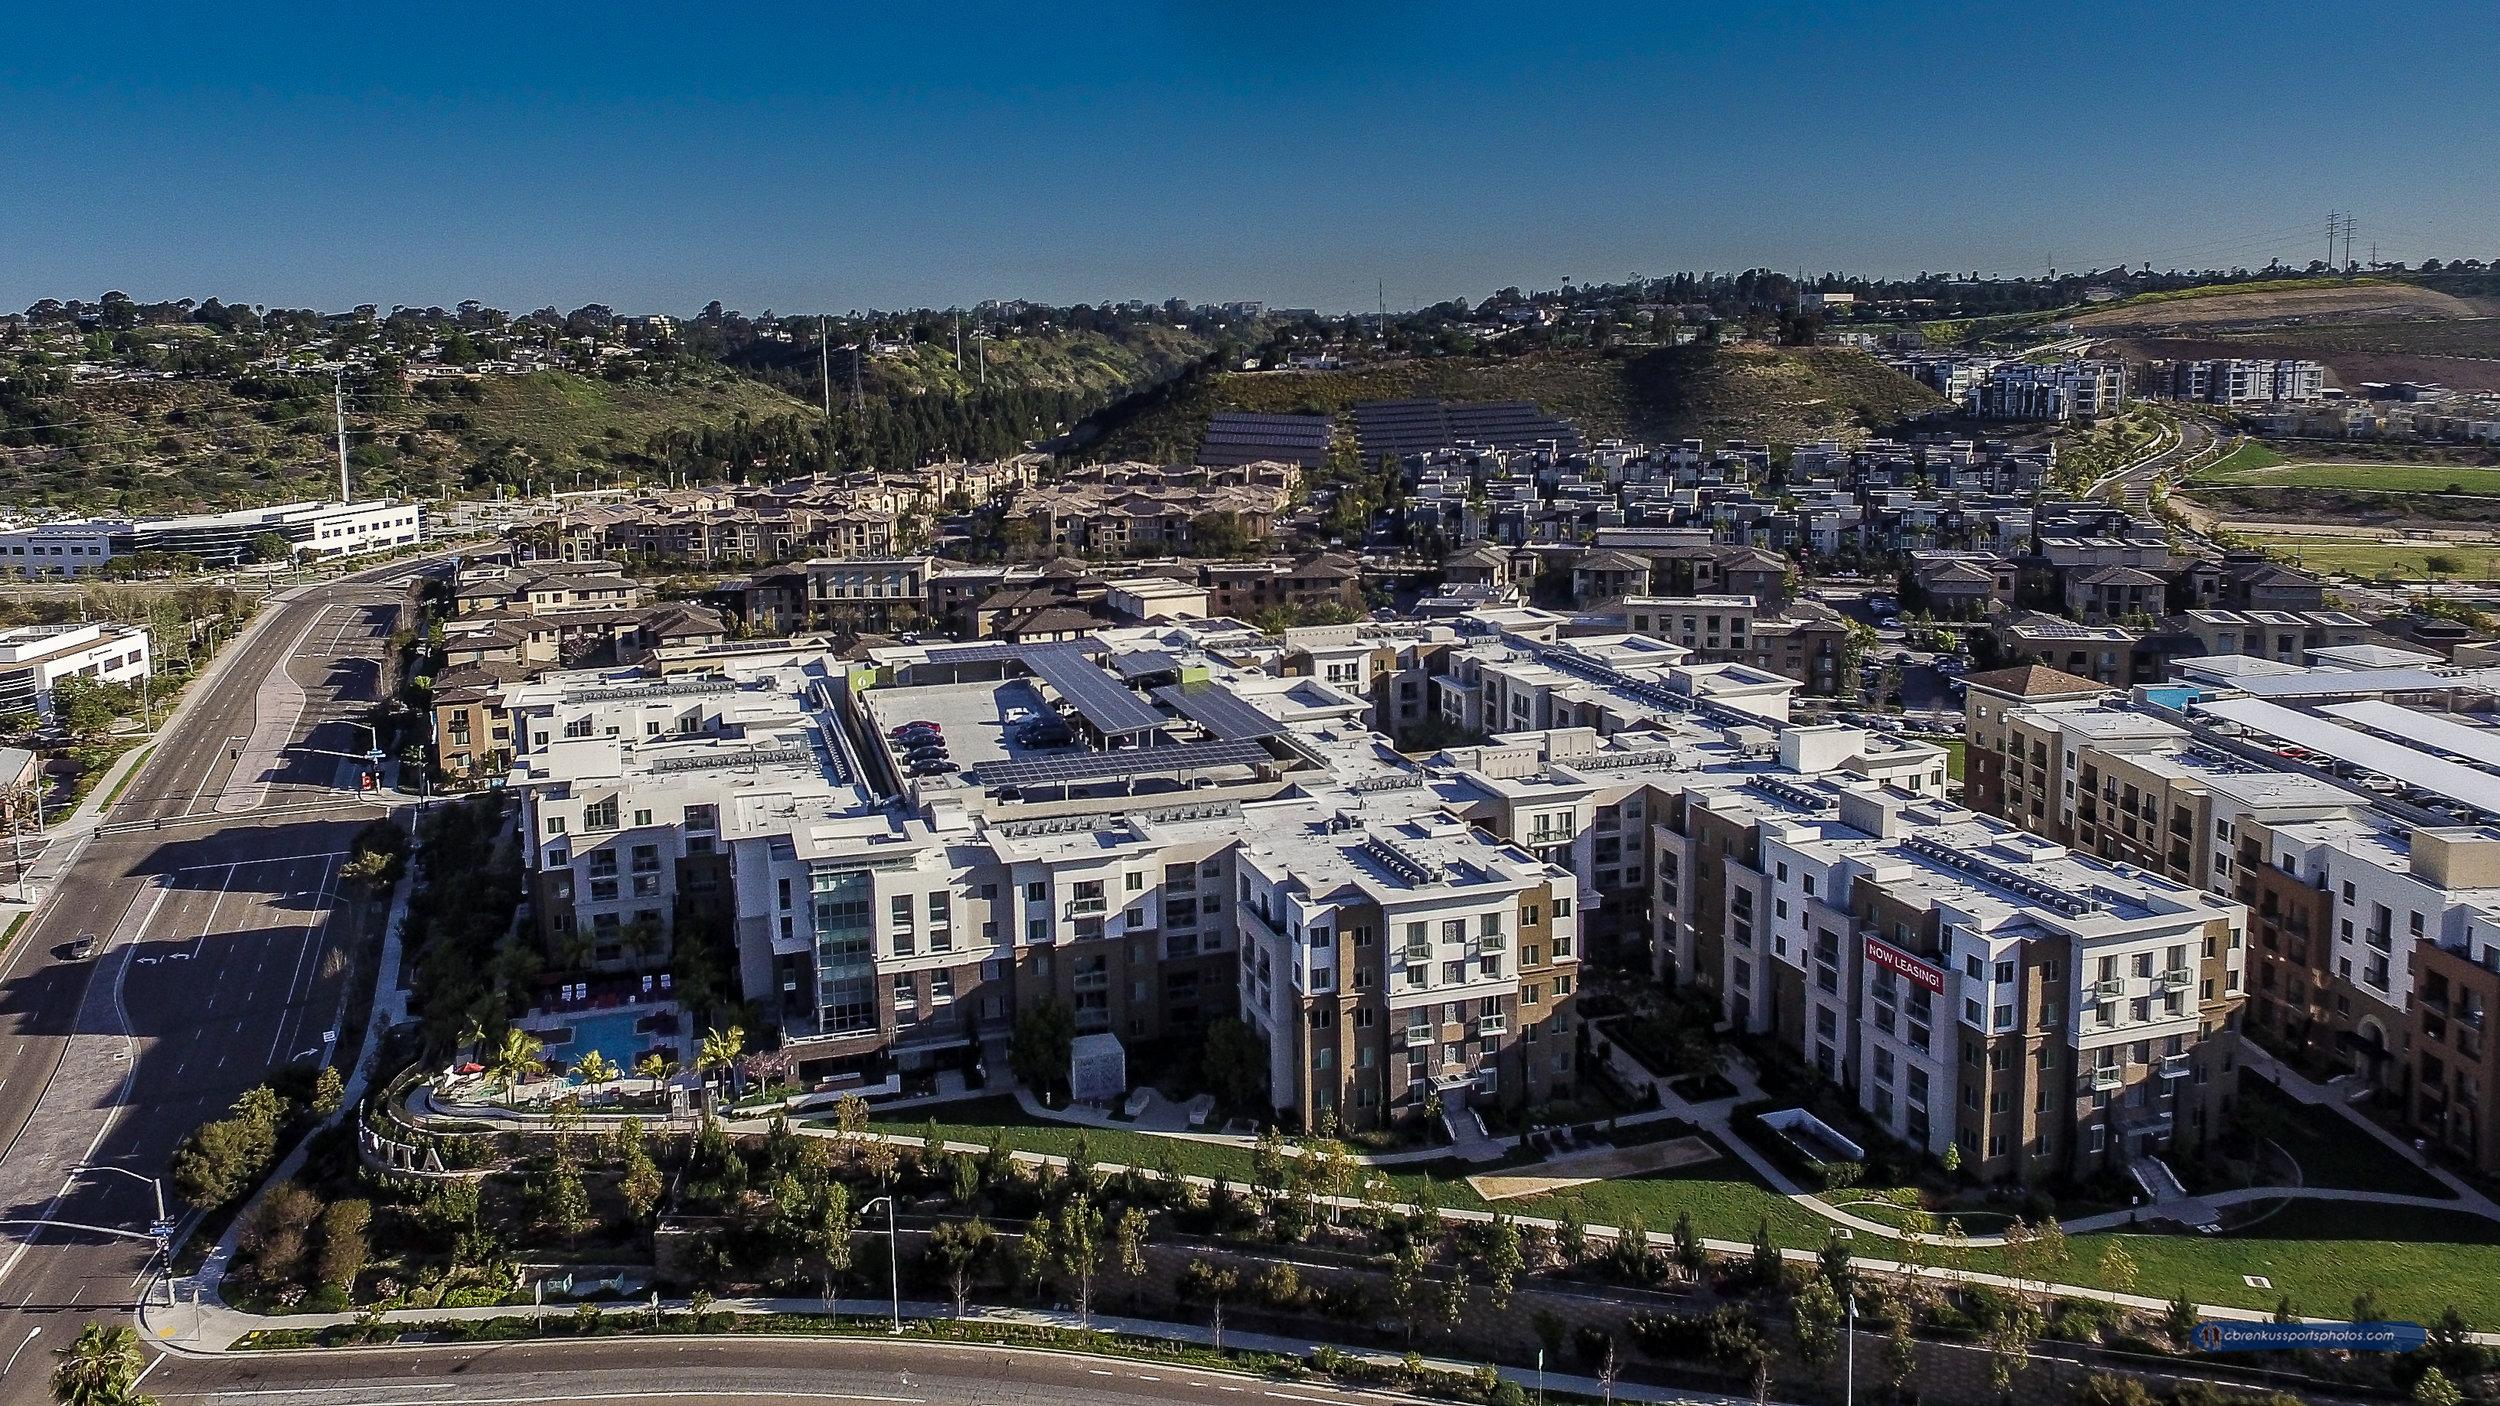 Civita - San DiegoSudberry Development